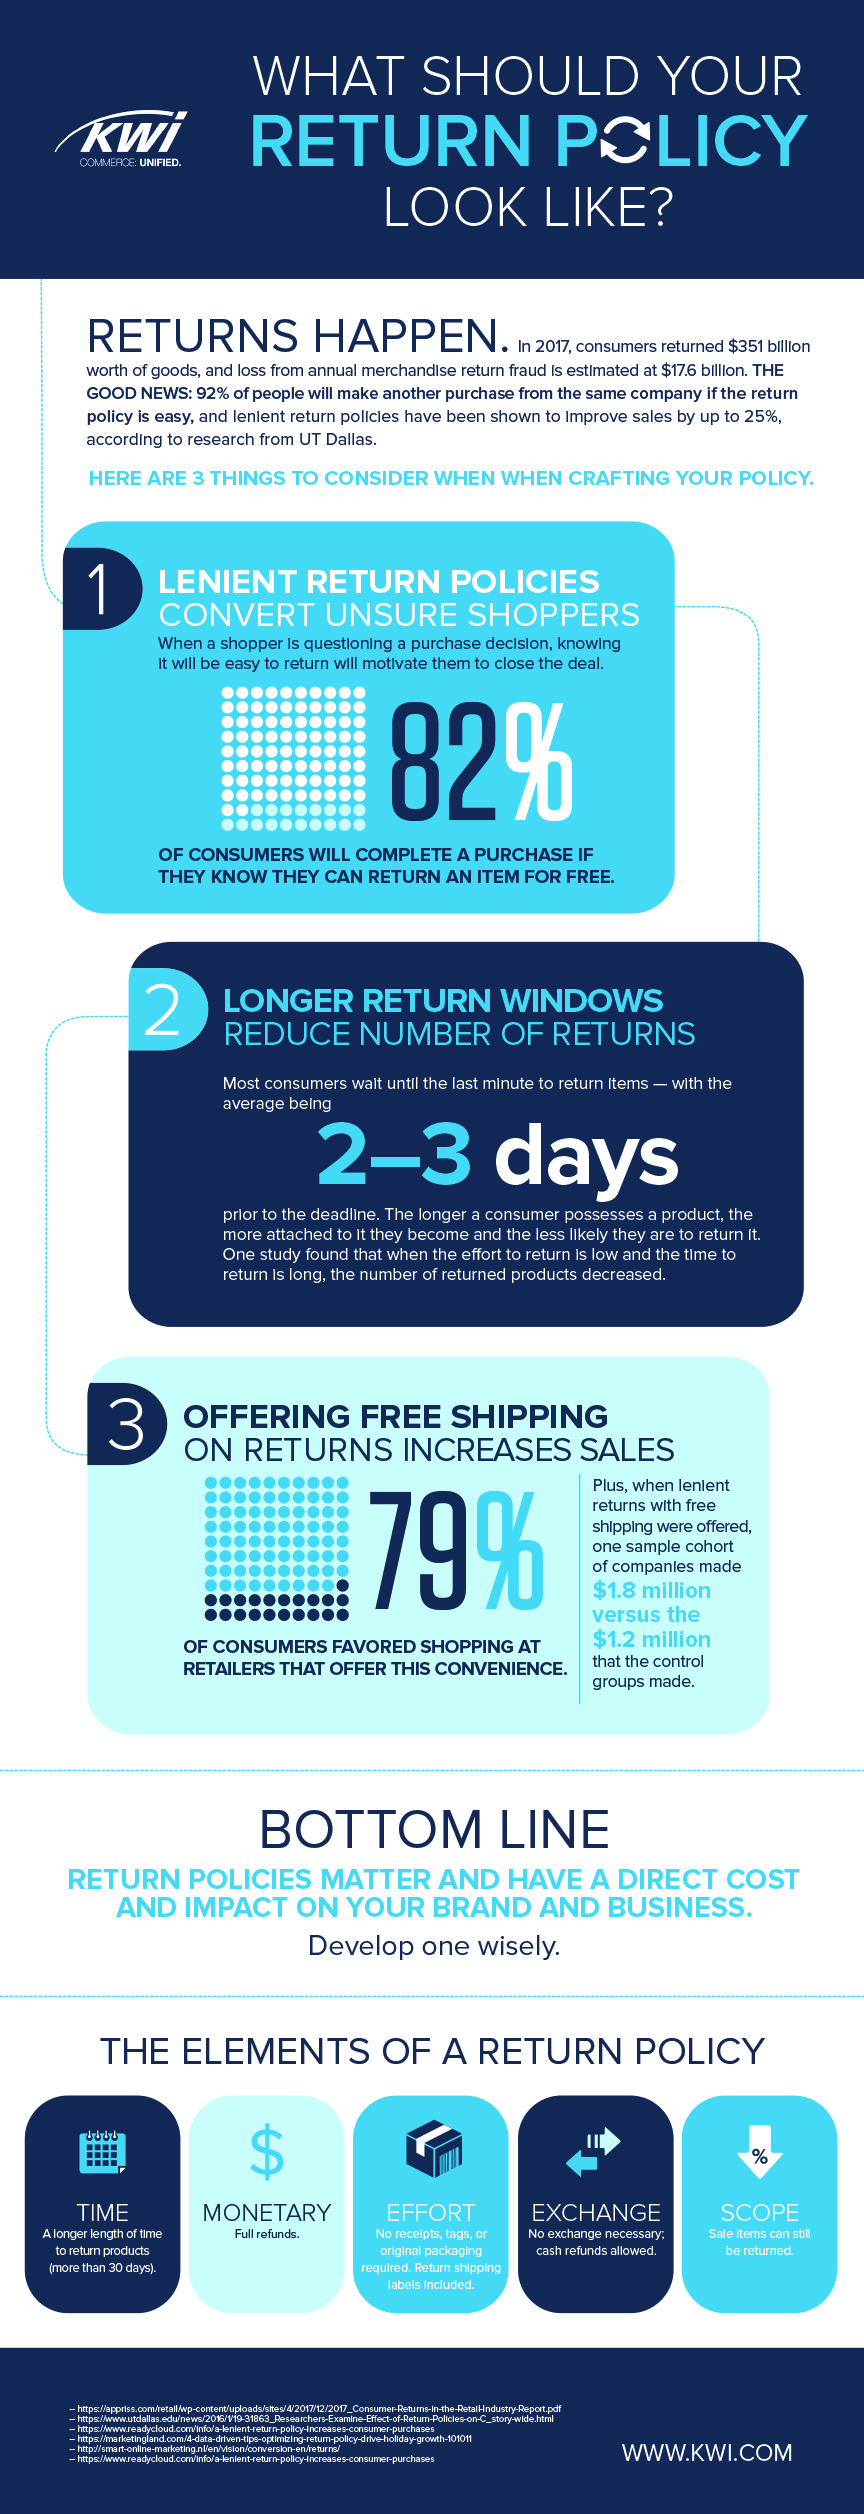 KWI_Stores Return Policies Infographic_5.1.18